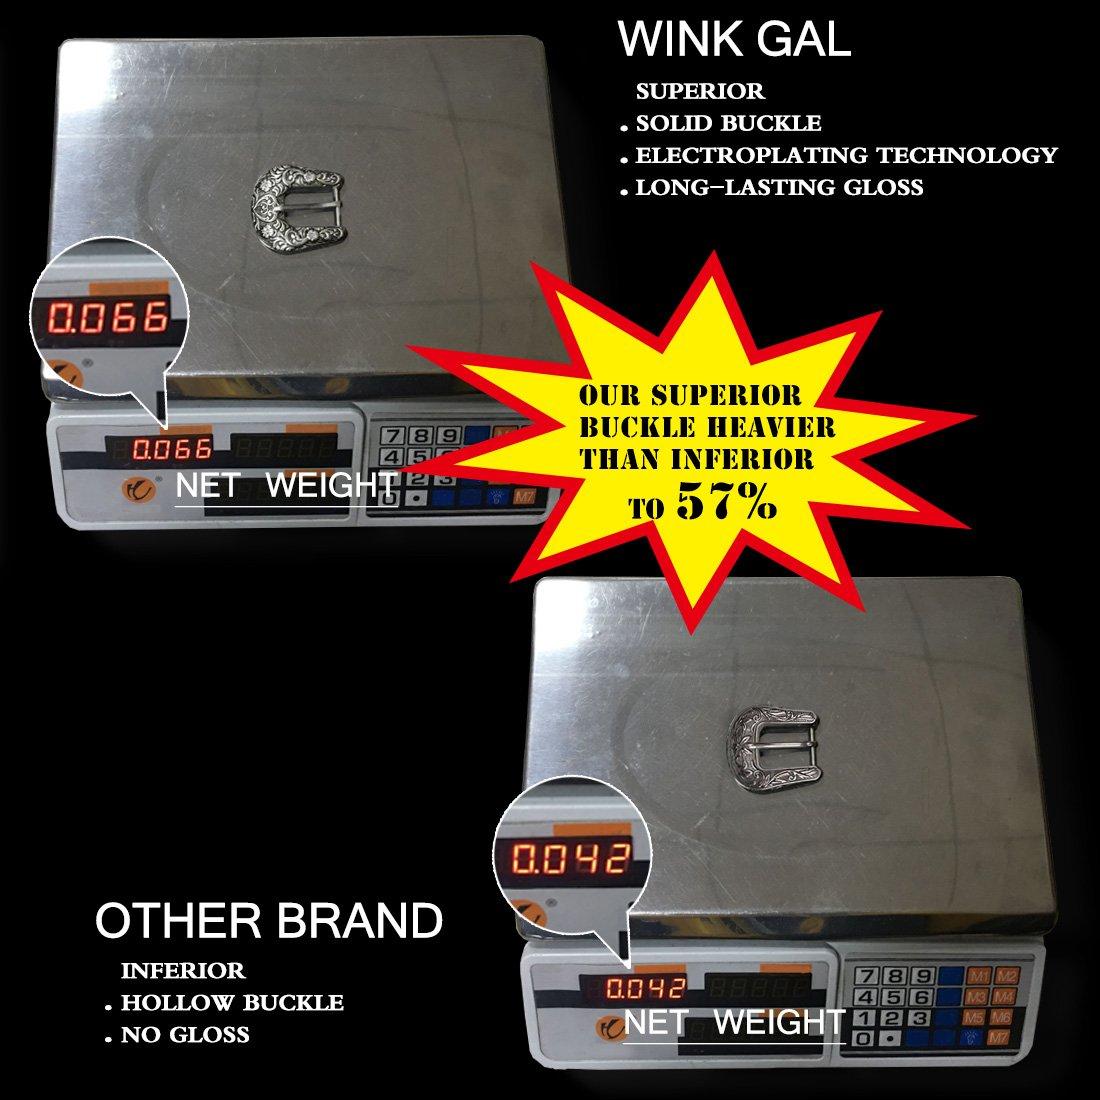 Wink Gal Women's Boho Metal Western Double Buckle Belt Sliver (Suit pants size 31''-34''(US size 12-16), Rivet Width Approx. 1'') by Wink Gal (Image #3)